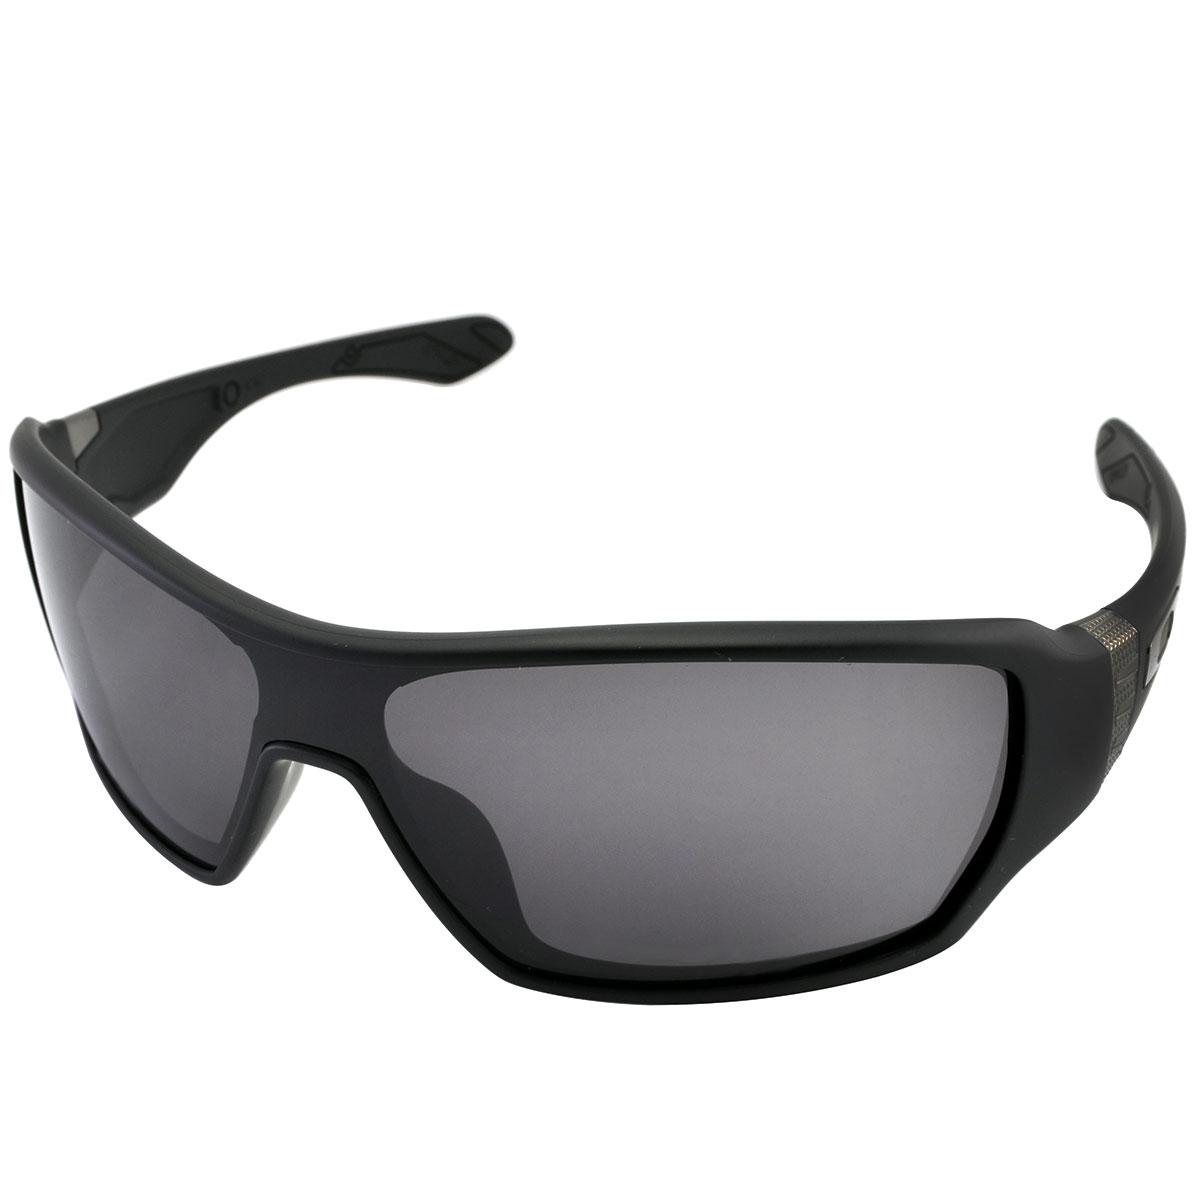 237f1b728f5e1 Óculos Oakley Offshoot Matte Black Lente Warm Grey ref OO9190-01